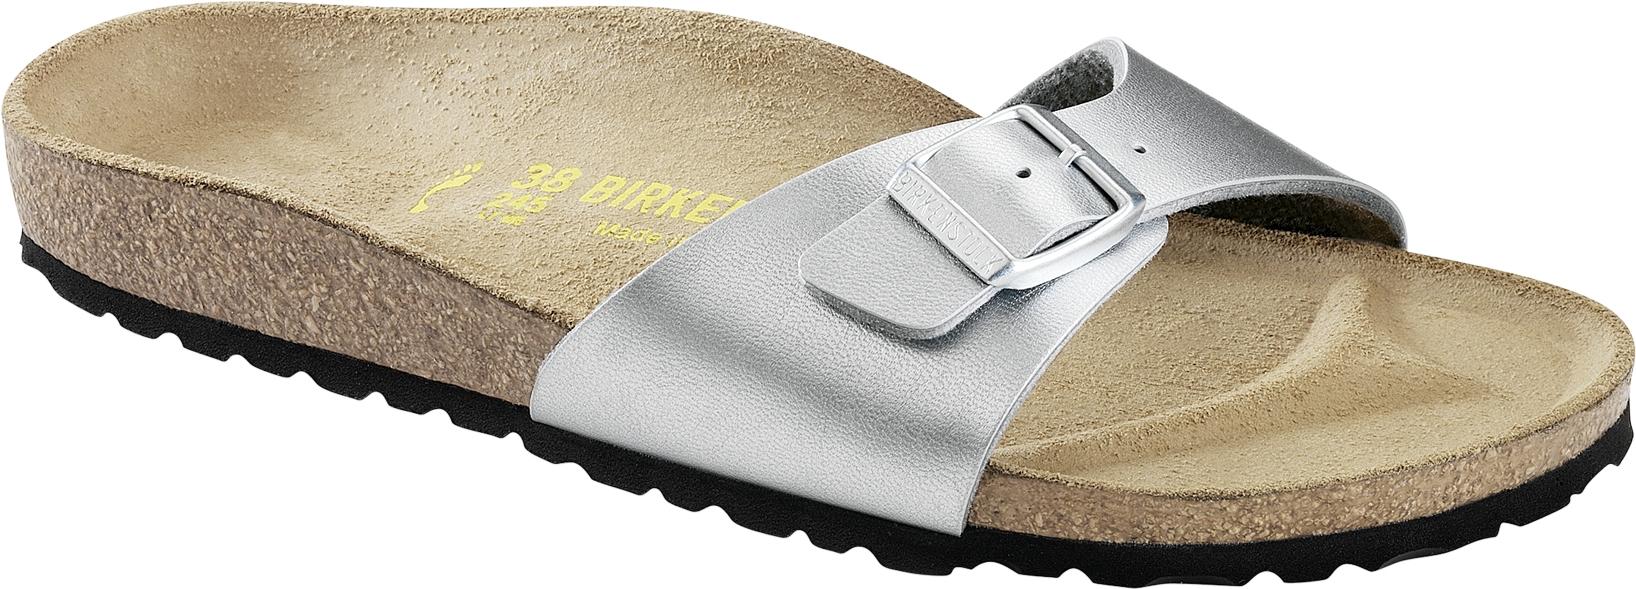 Stříbrné pantofle Birkenstock Madrid Birko-Flor - 37